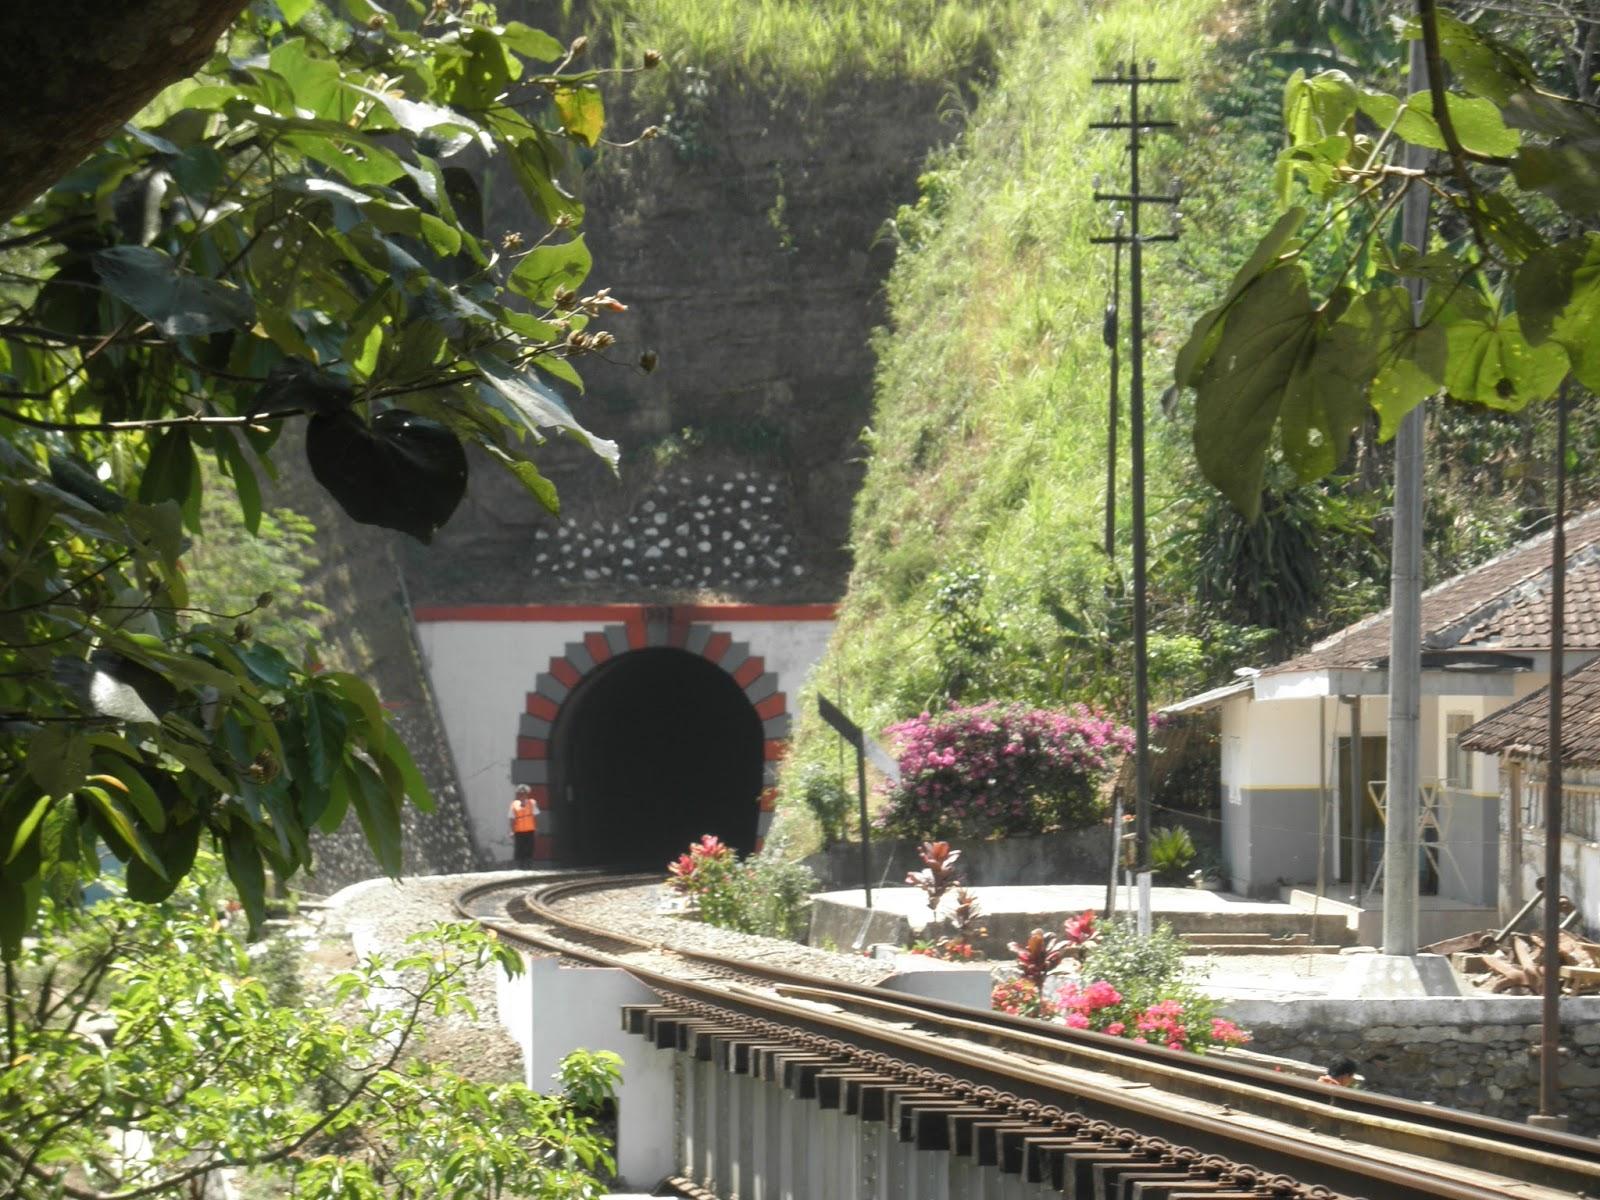 Menyusuri Jejak Kolonial Lori Wisata Kalibaru Garahan Terowongan Sumber Drpaca